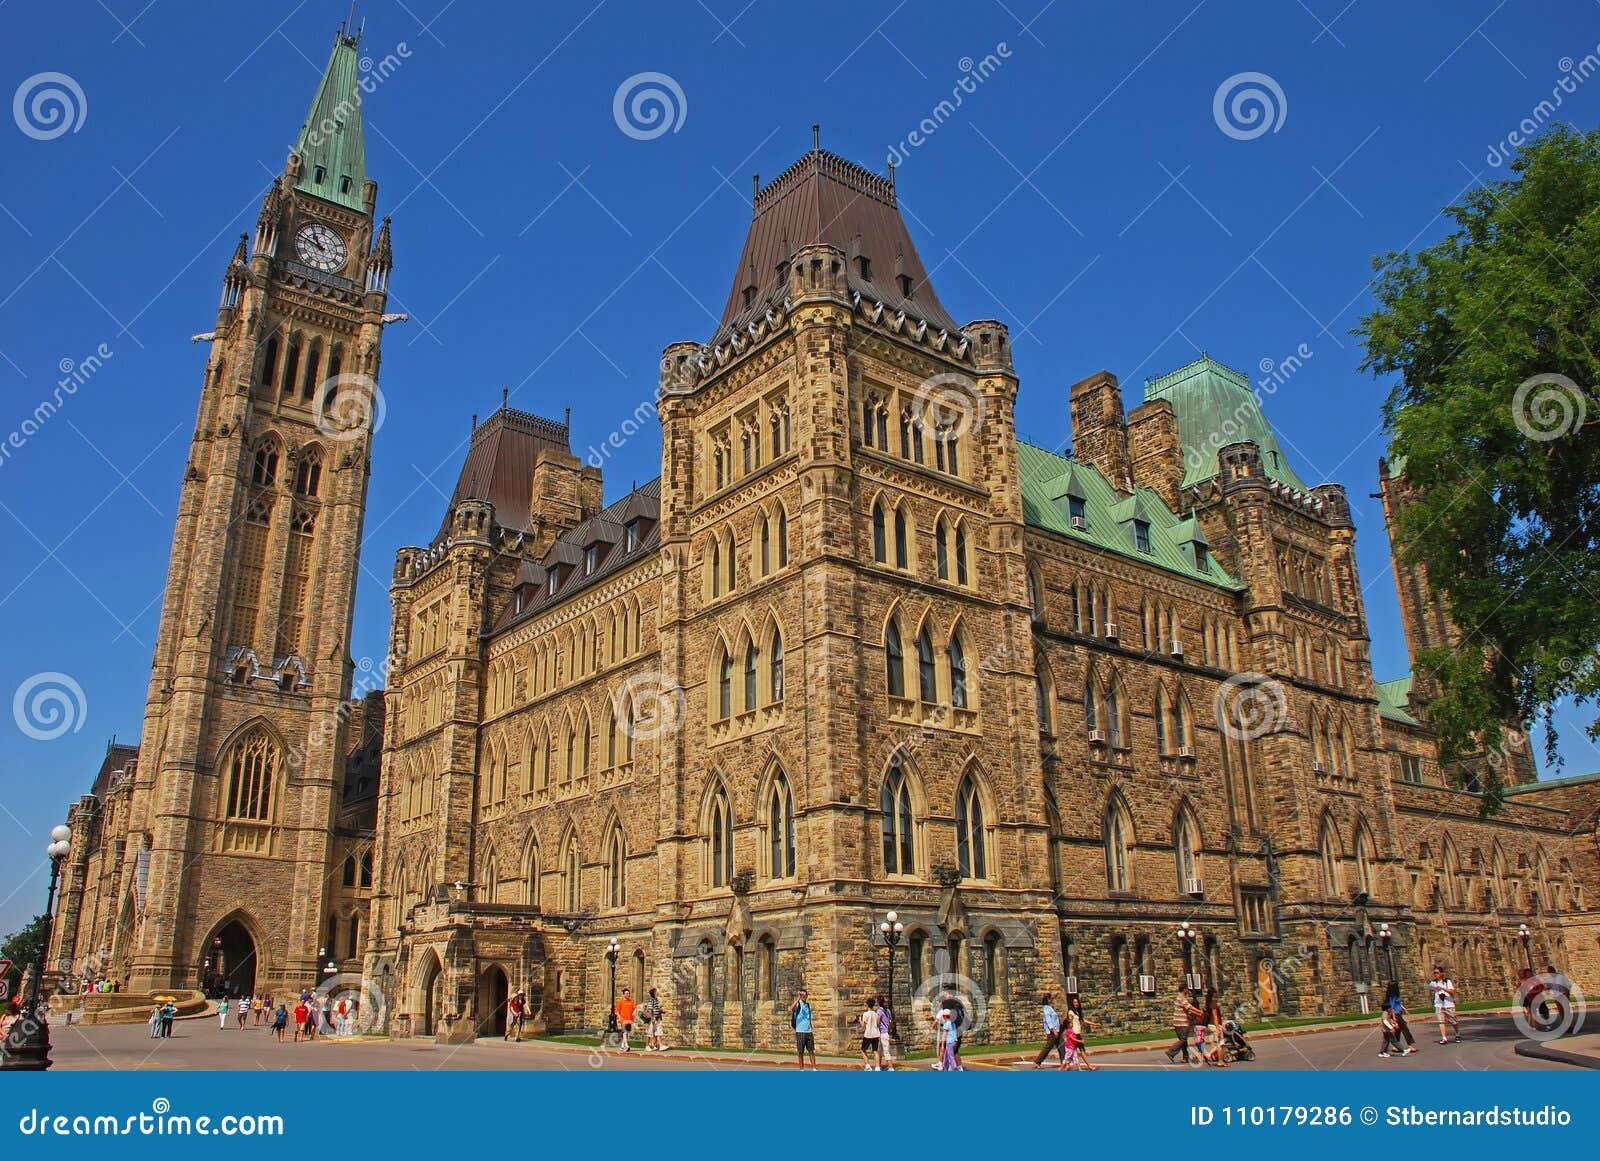 Это блок который главное здание канадского парламентского комплекса на холме парламента, Оттава центра, Онтарио, Канада